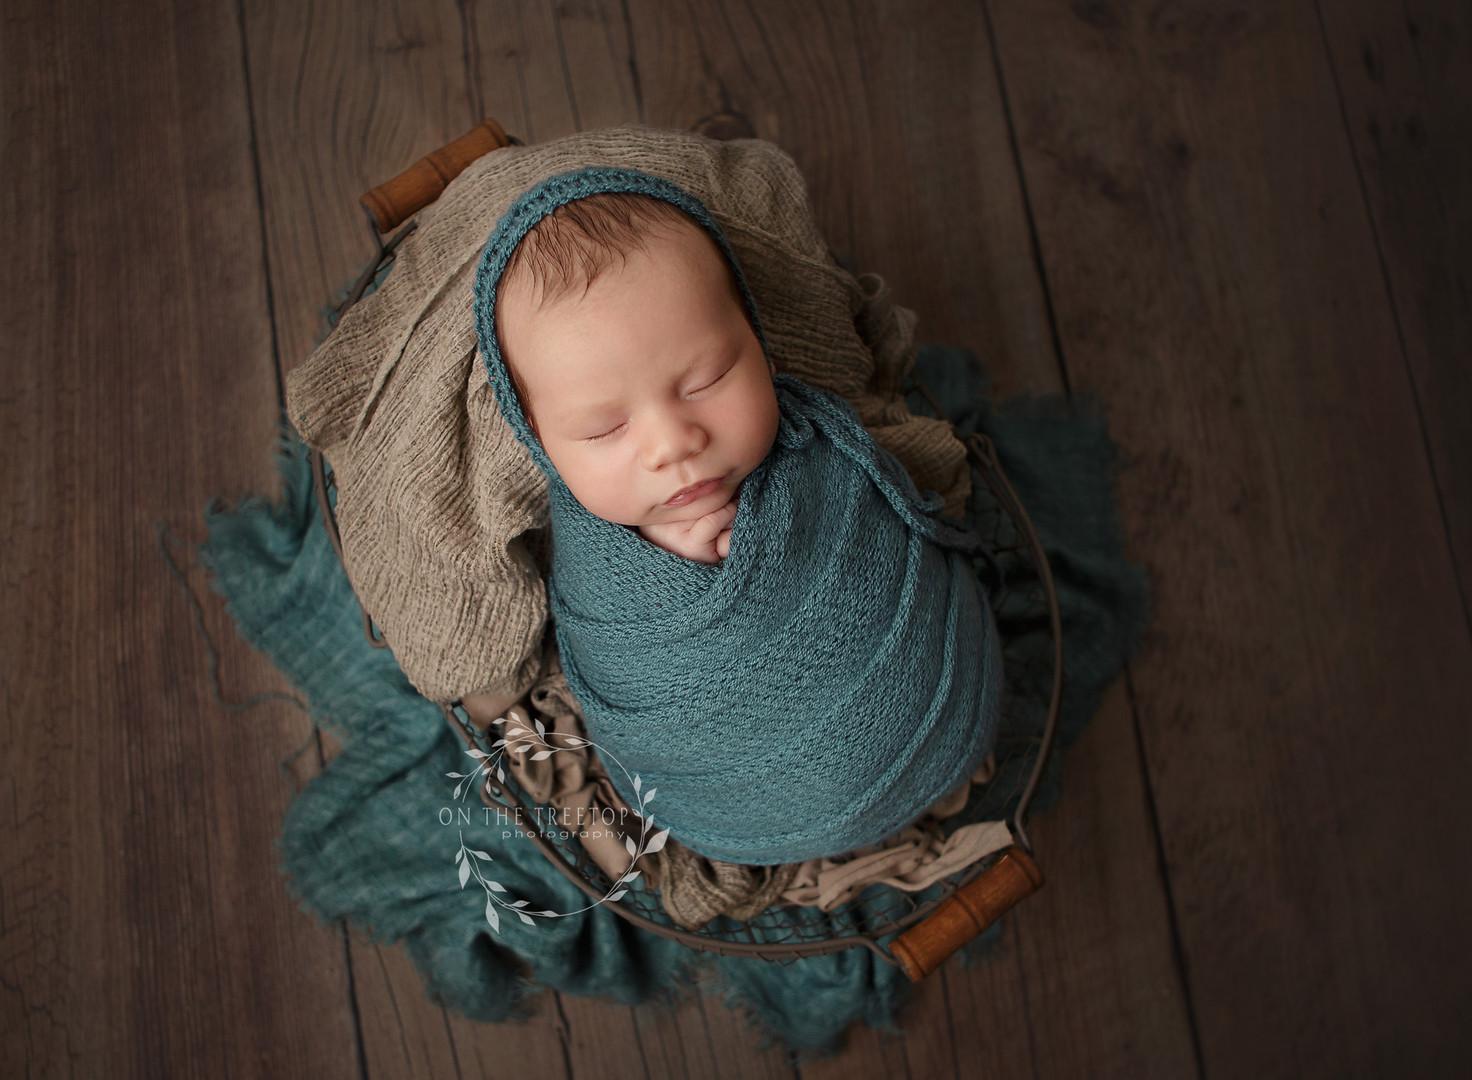 photograph of a newborn boy in a basket